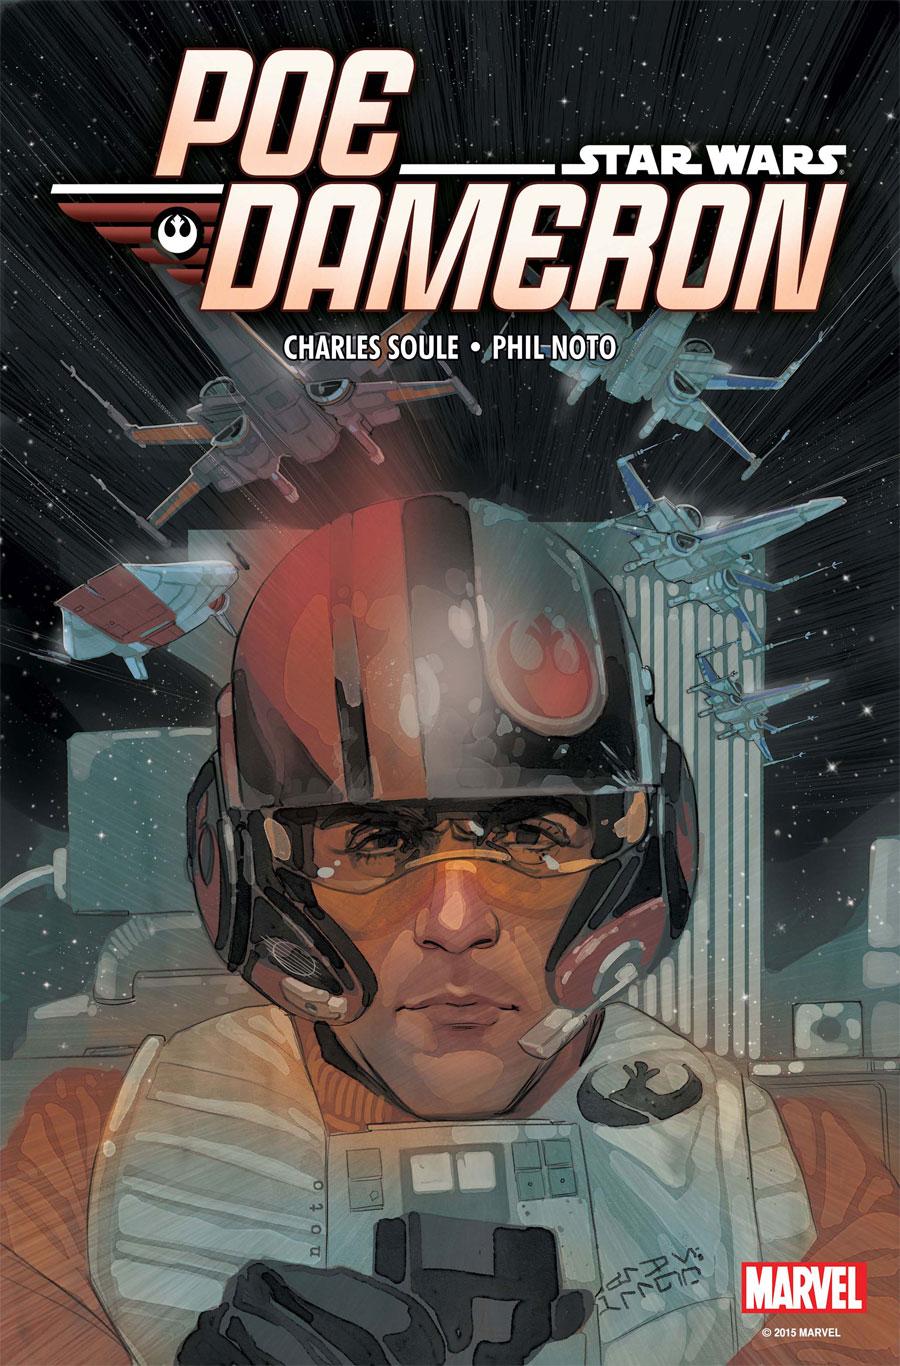 POE DAMERON #1 cover